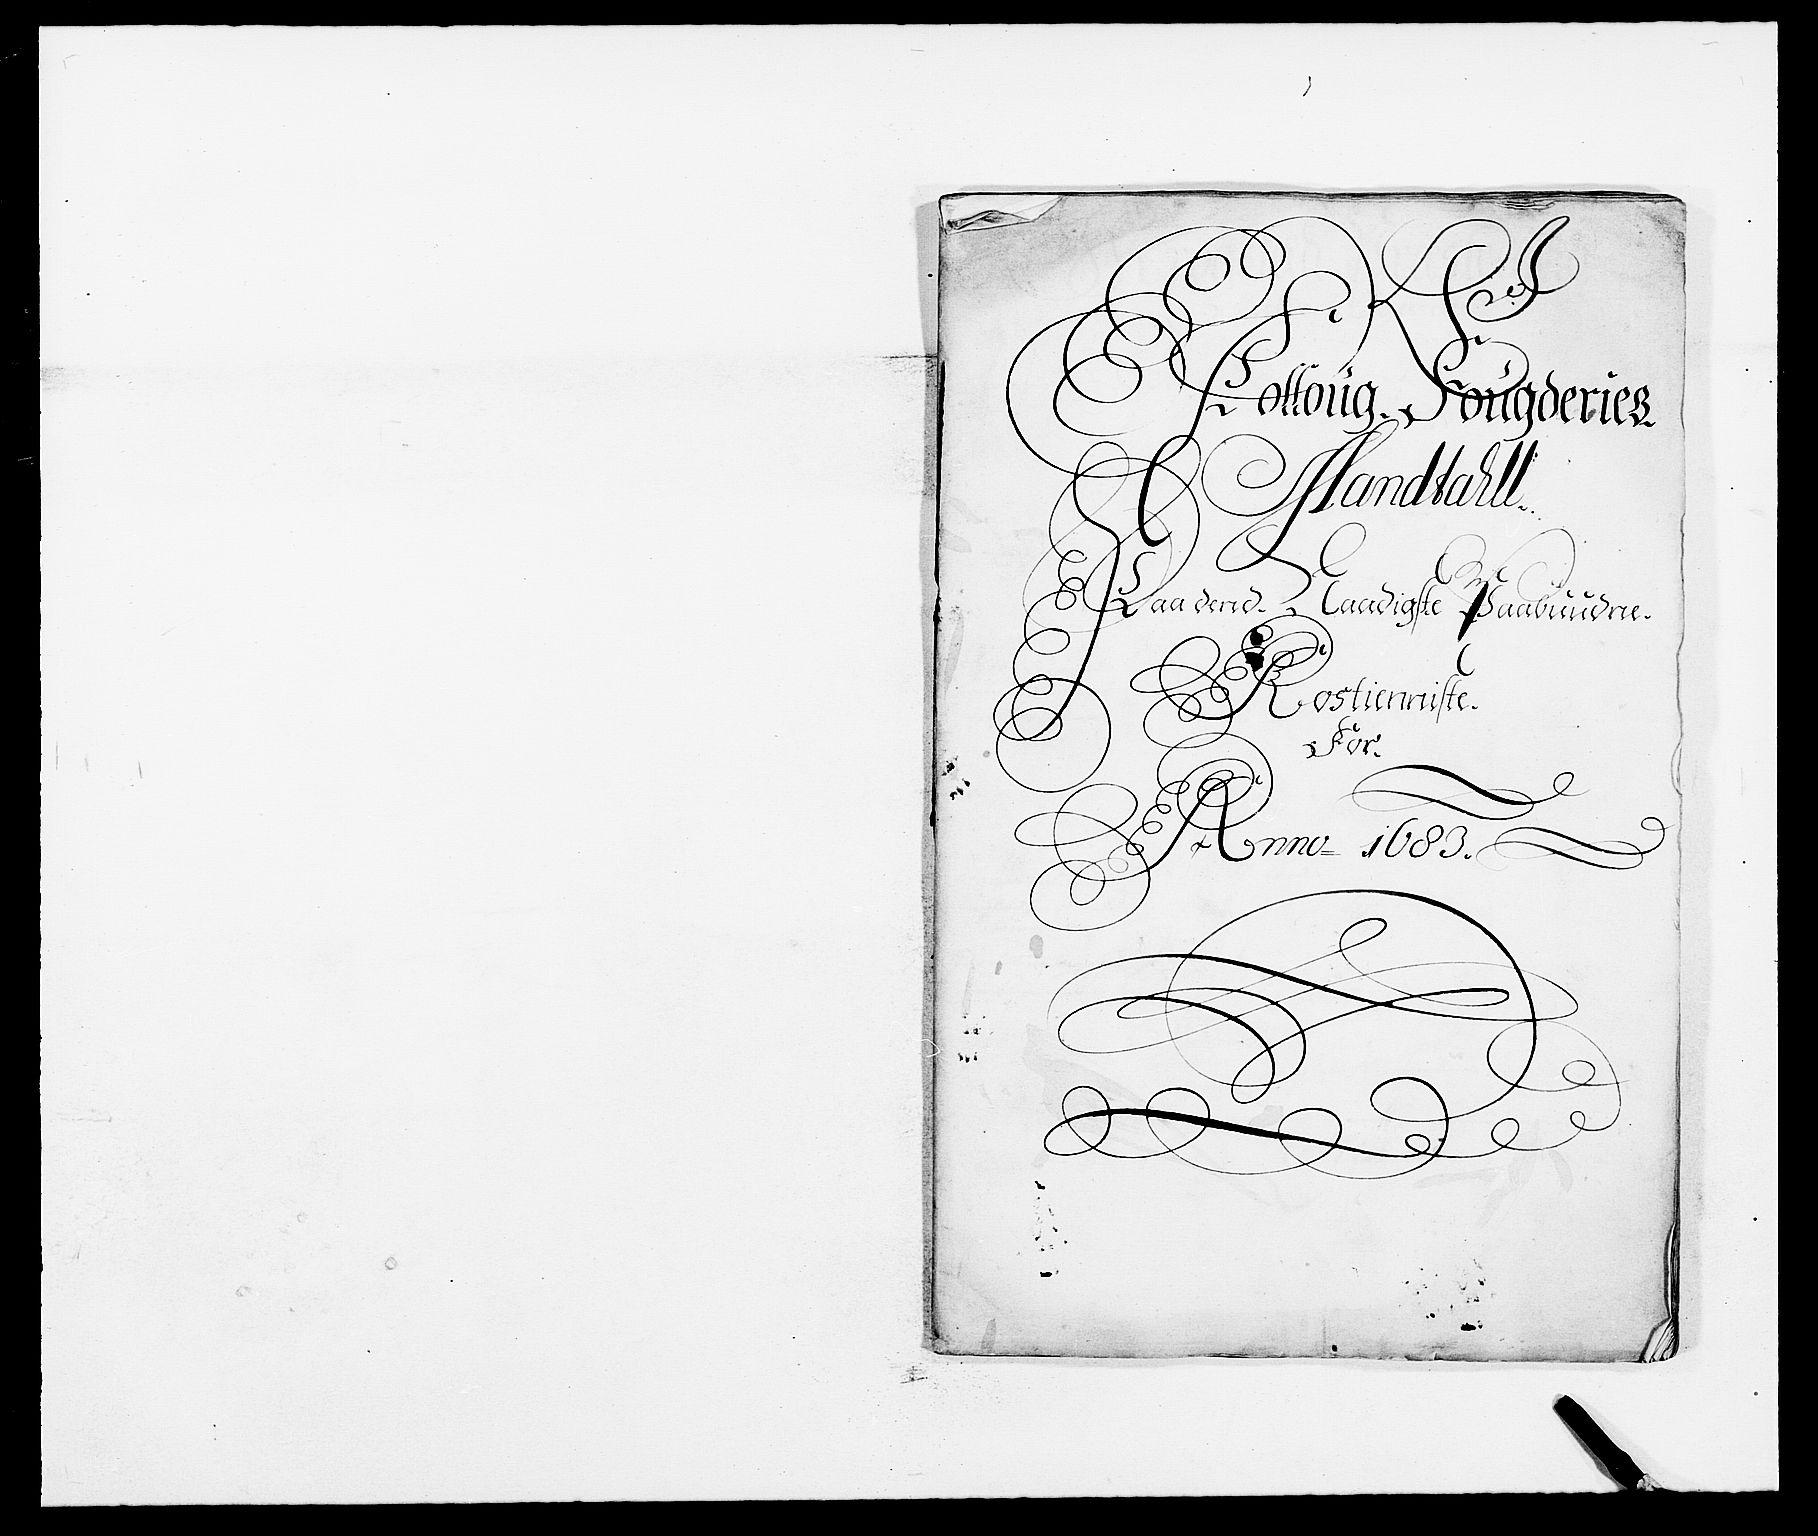 RA, Rentekammeret inntil 1814, Reviderte regnskaper, Fogderegnskap, R09/L0430: Fogderegnskap Follo, 1682-1683, s. 441